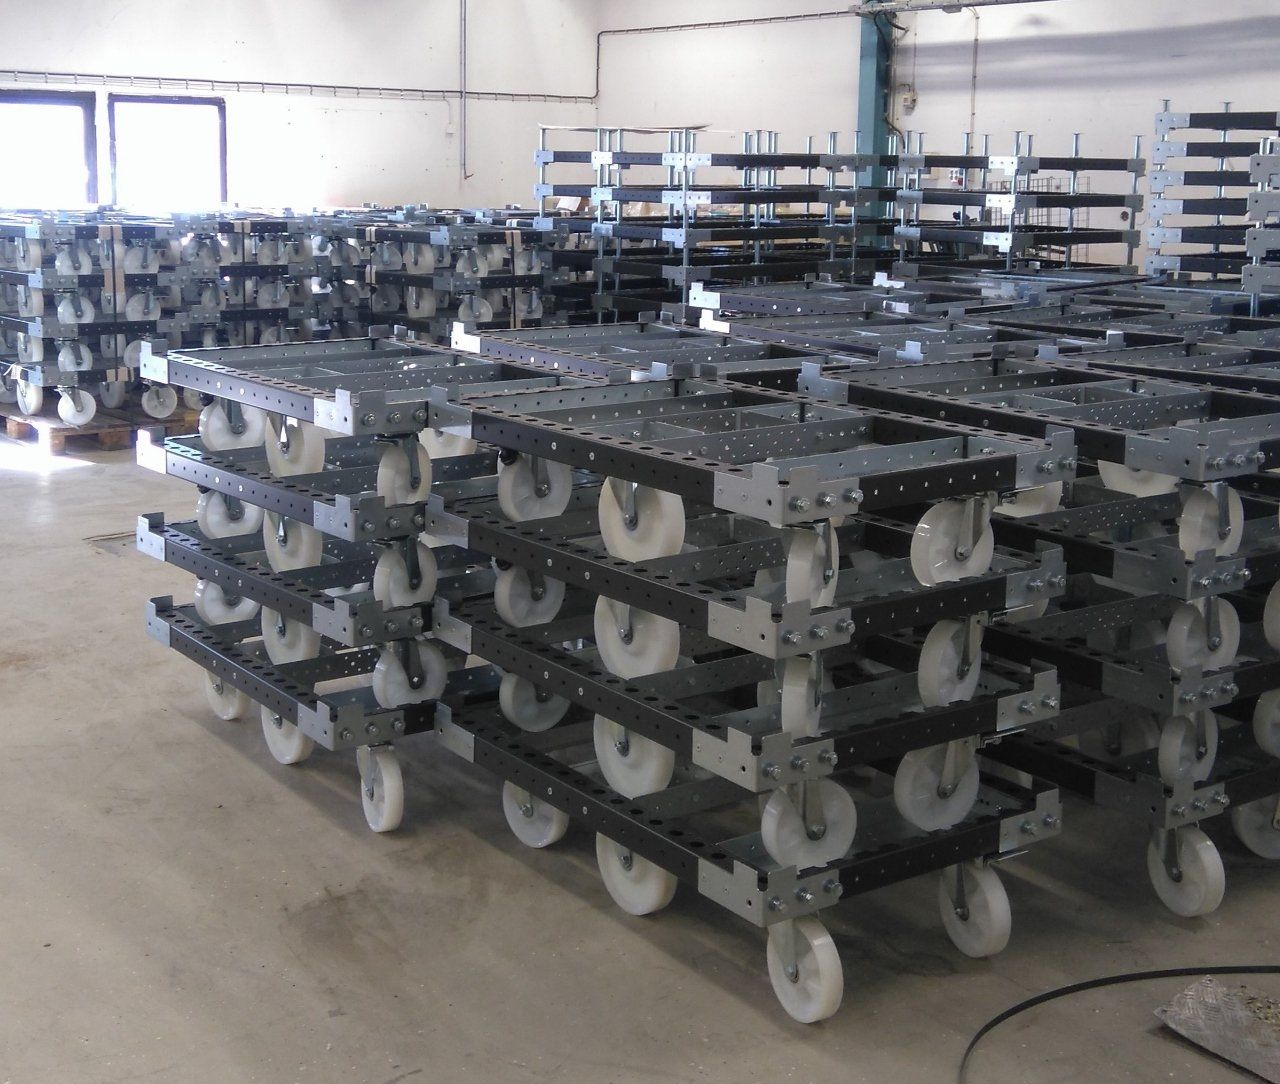 FlexQube pallet carts stacked together